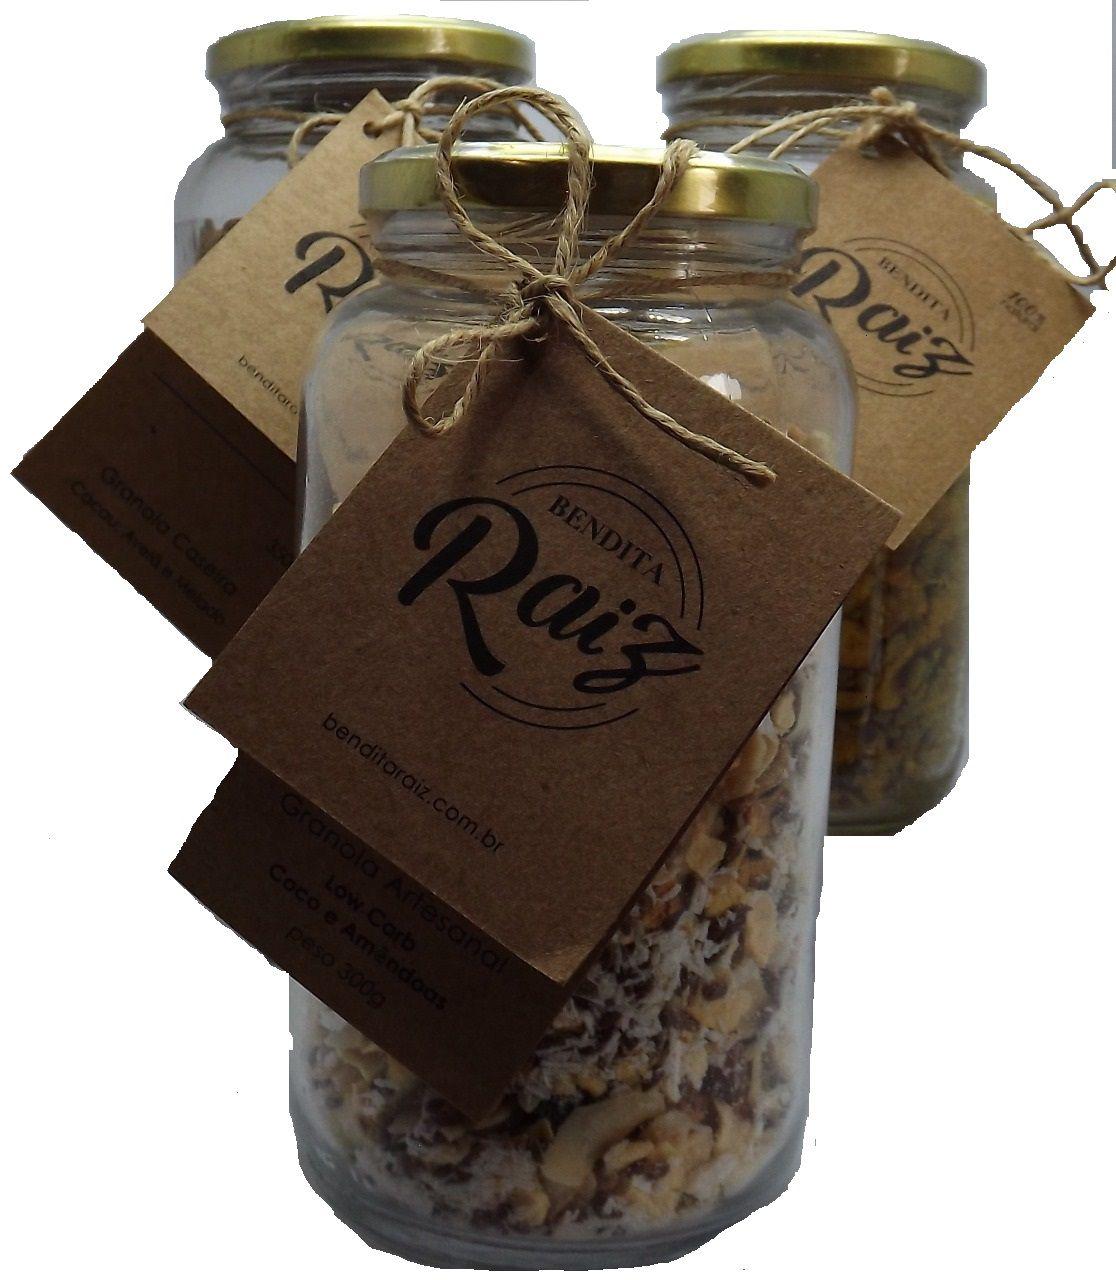 Bendita Raiz - Granola Artesanal Salgada 300g